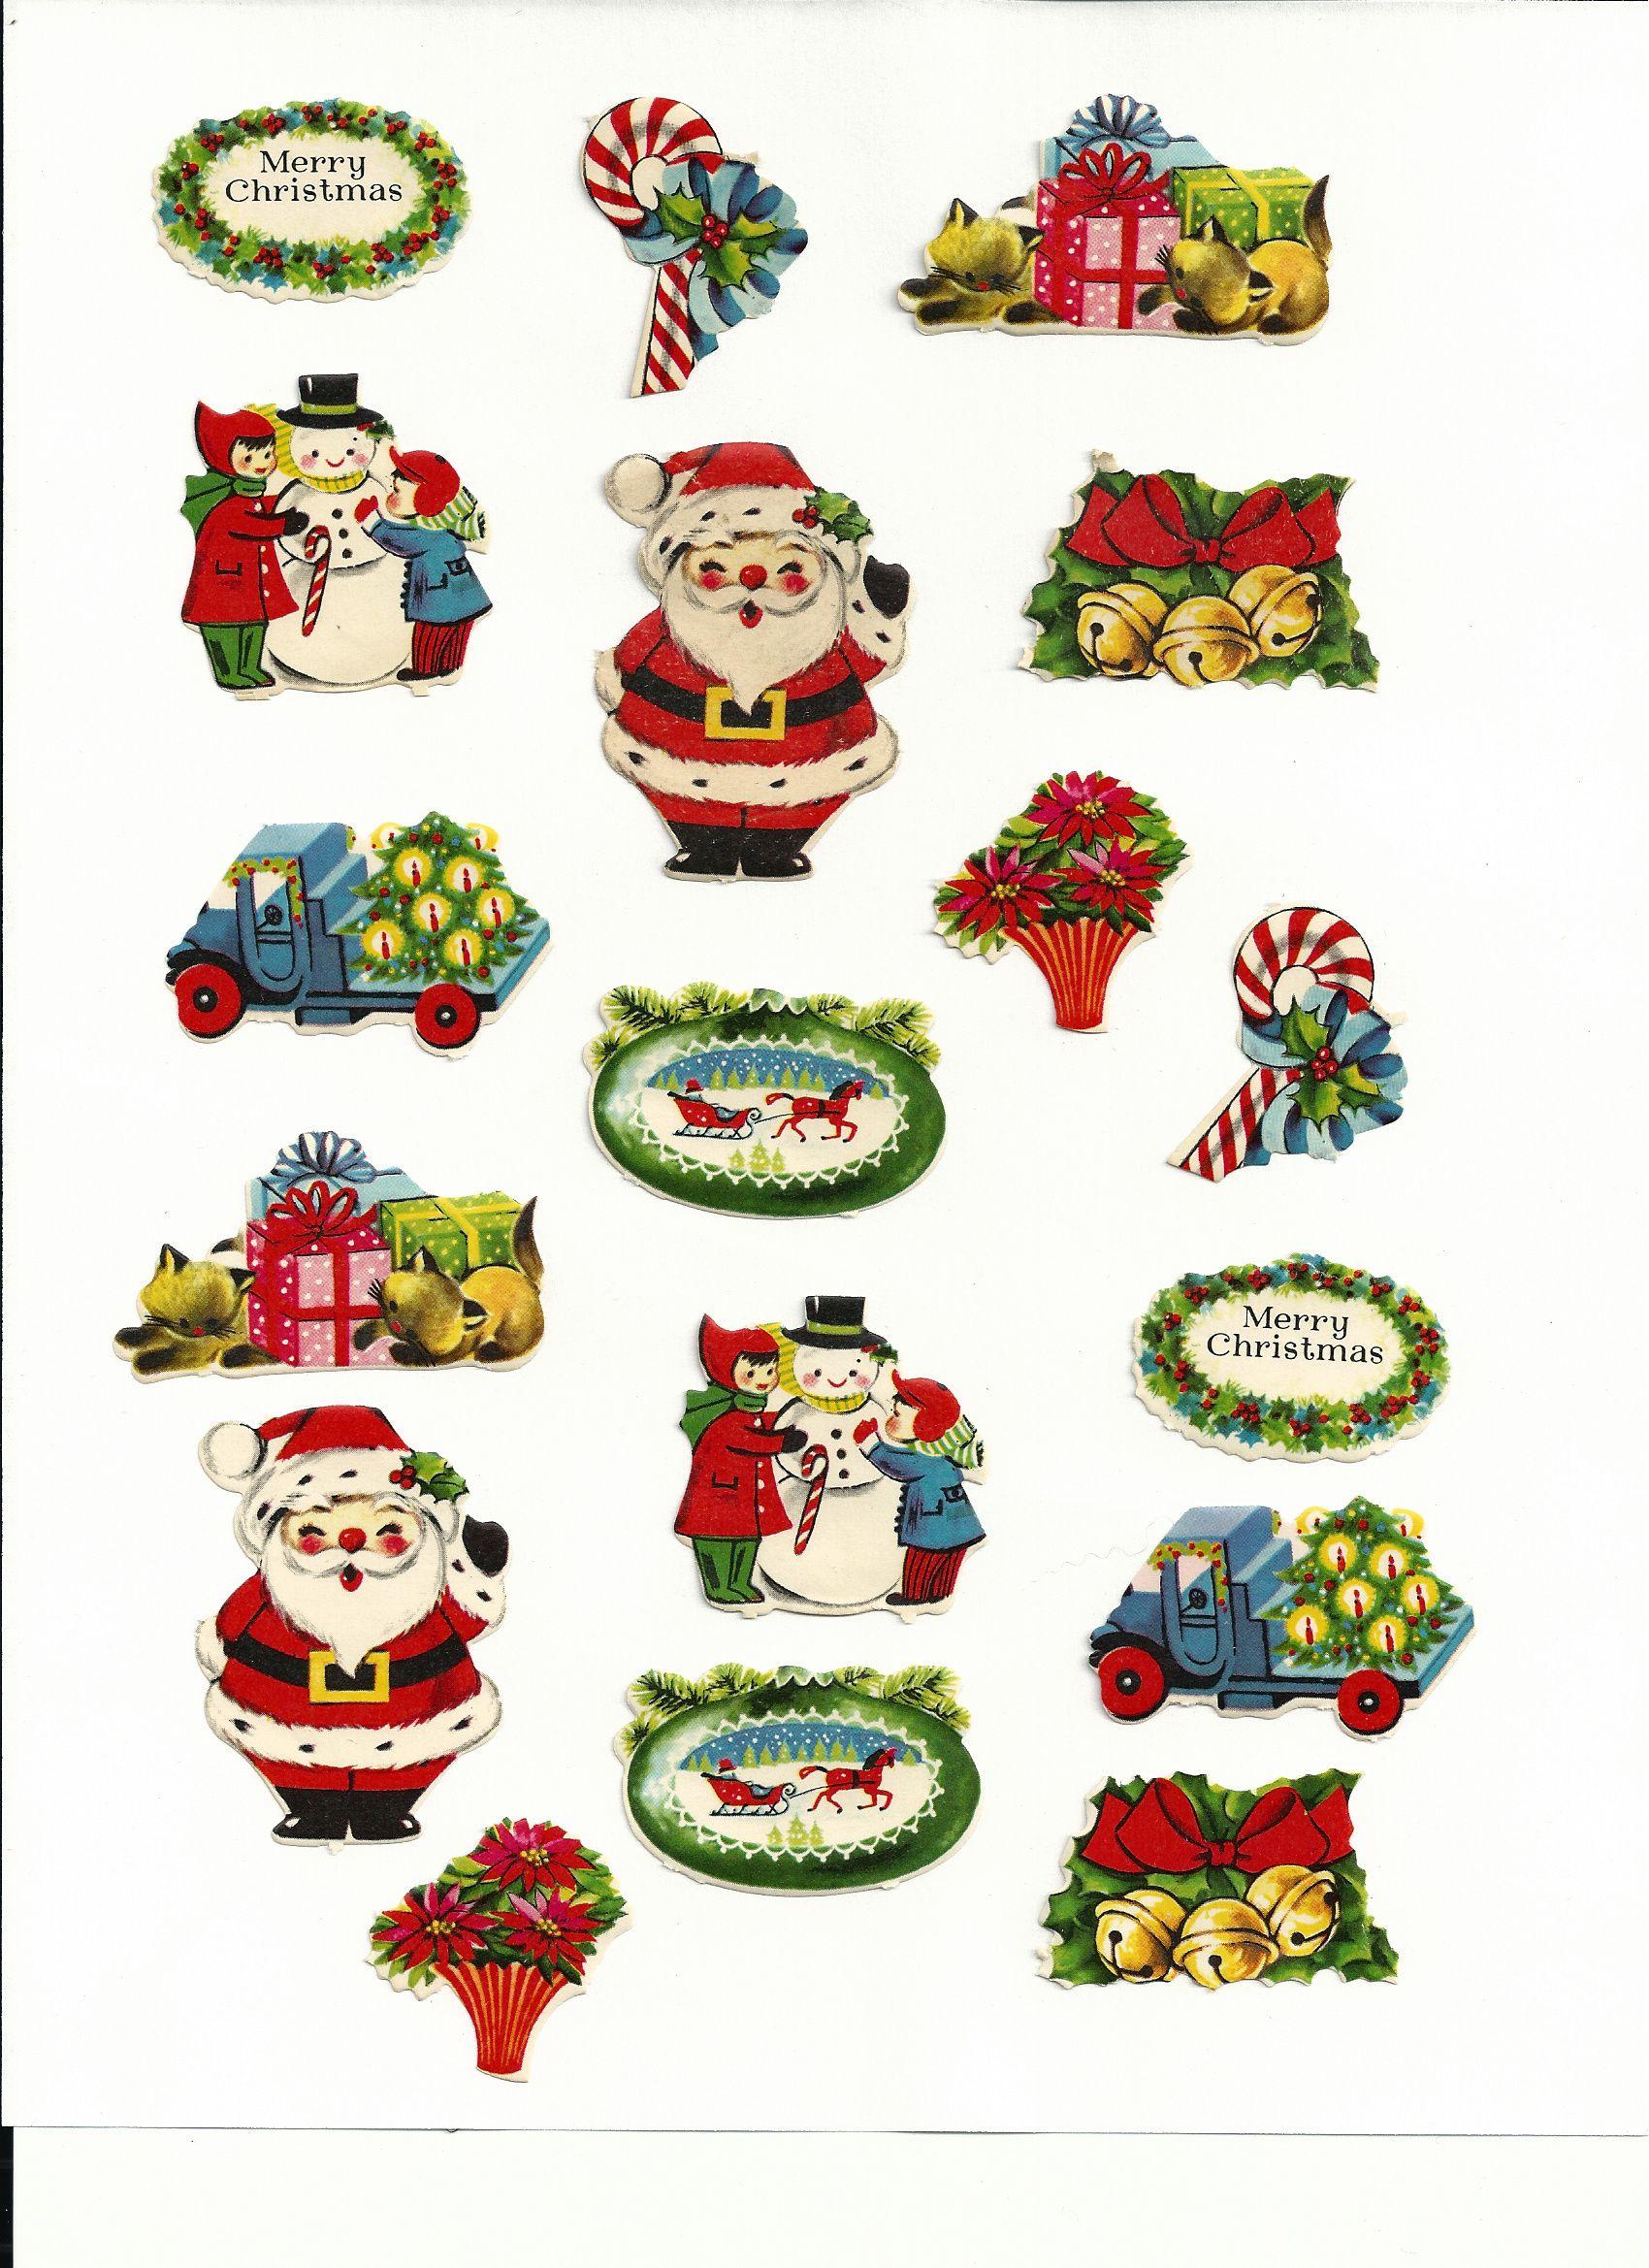 Pin By Linda Cattin On Vintage Christmas Christmas Packaging Christmas Stickers Vintage Christmas